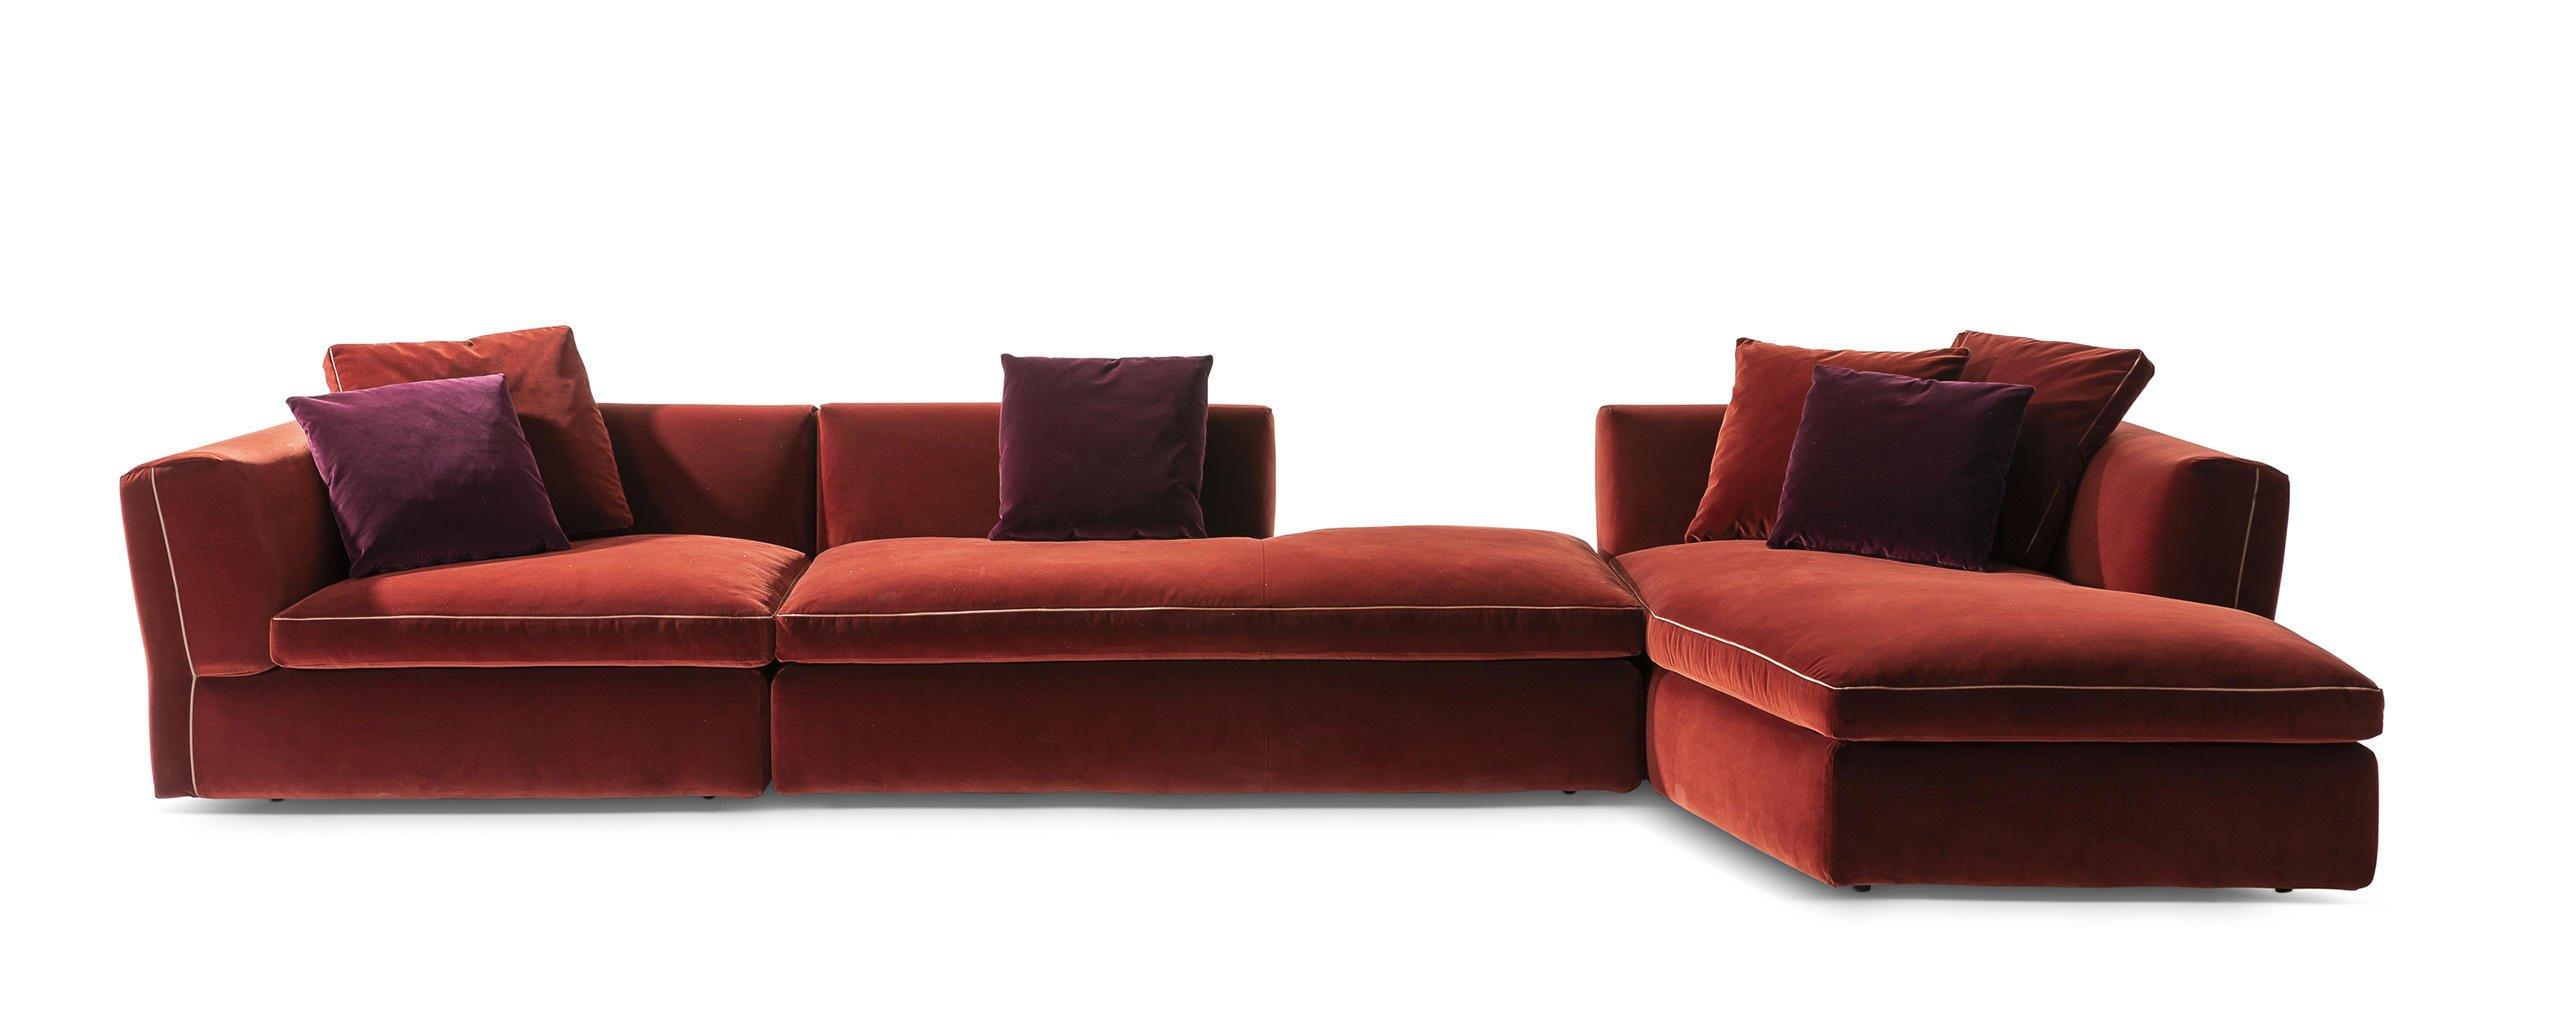 Full Size of Cassina Sofa Furniture Myworld Mister Nest Toot For Sale 8 Otto Maralunga Gebraucht Moov Sofas Uk Aspen Big Günstig Schlaf Ikea Mit Schlaffunktion Aus Sofa Cassina Sofa